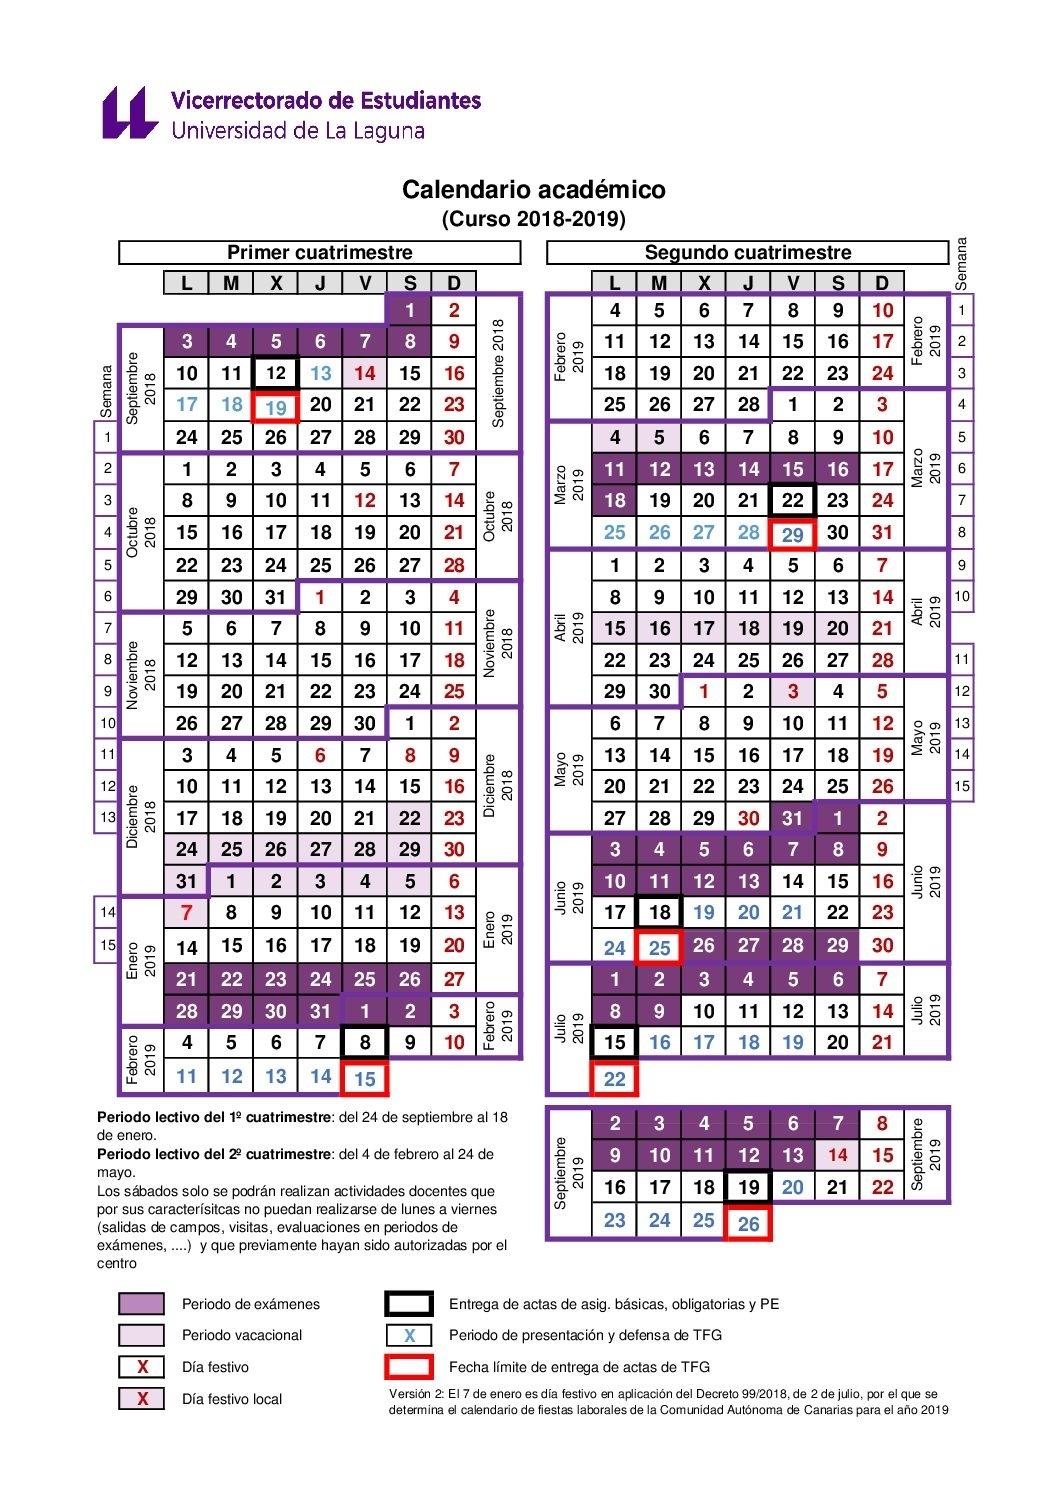 Ysu Academic Calendar 2020 | Free Printable Calendar